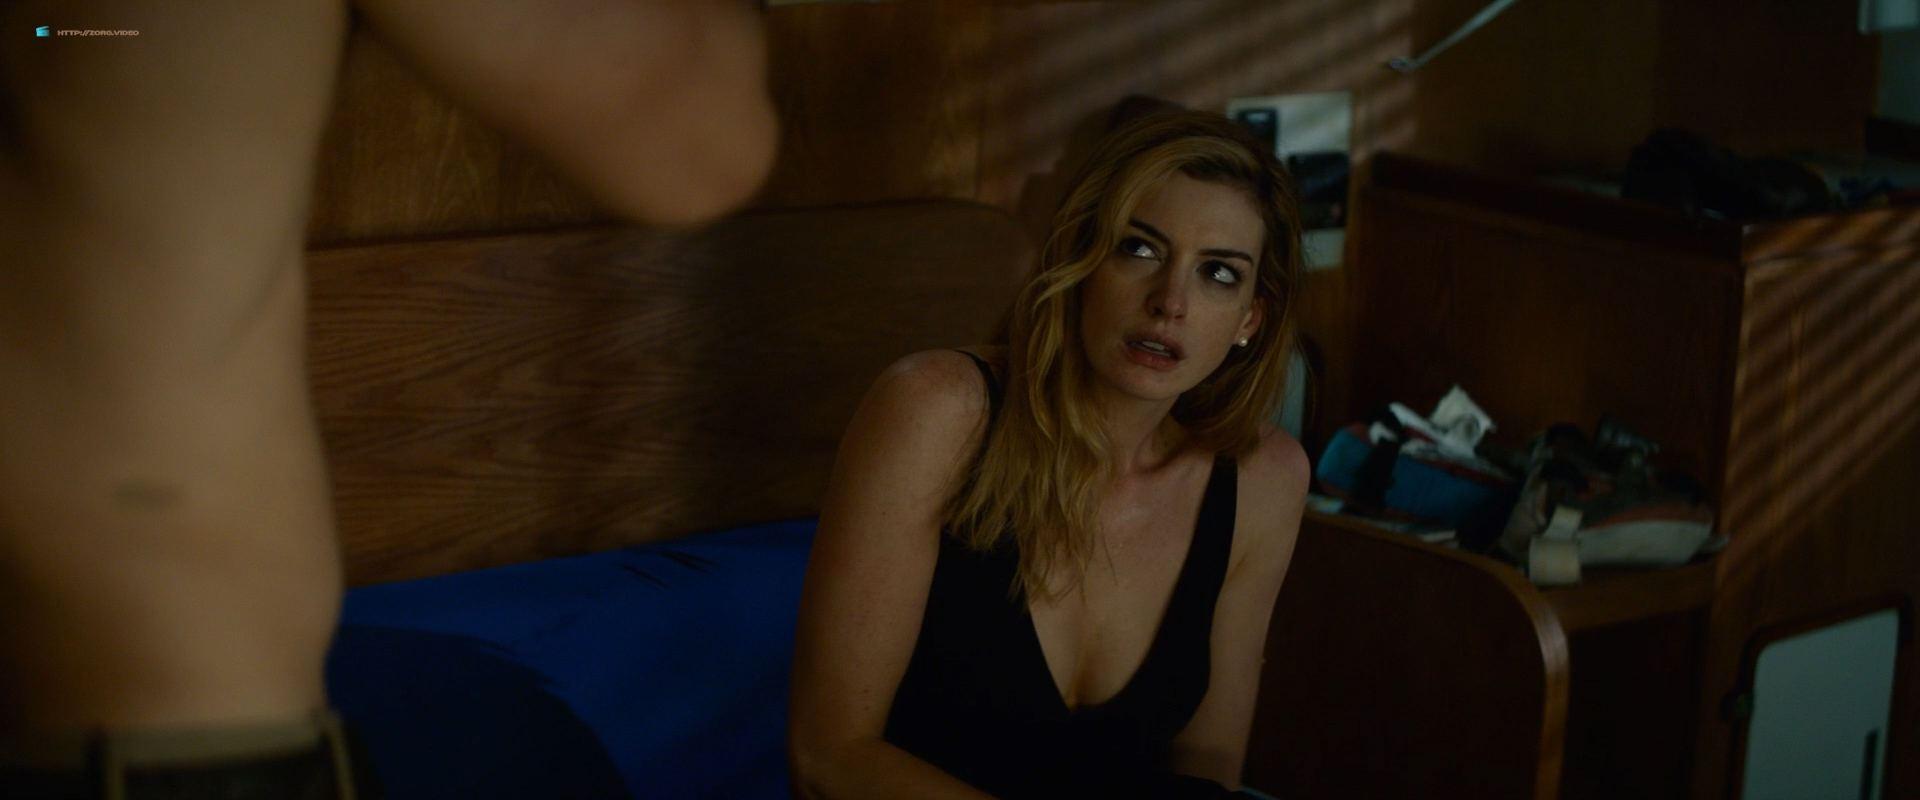 0201153347964_03_Anne-Hathaway-hot-in-sex-scene-Serenity-2019-HD-1080p-BluRay-00013.jpg